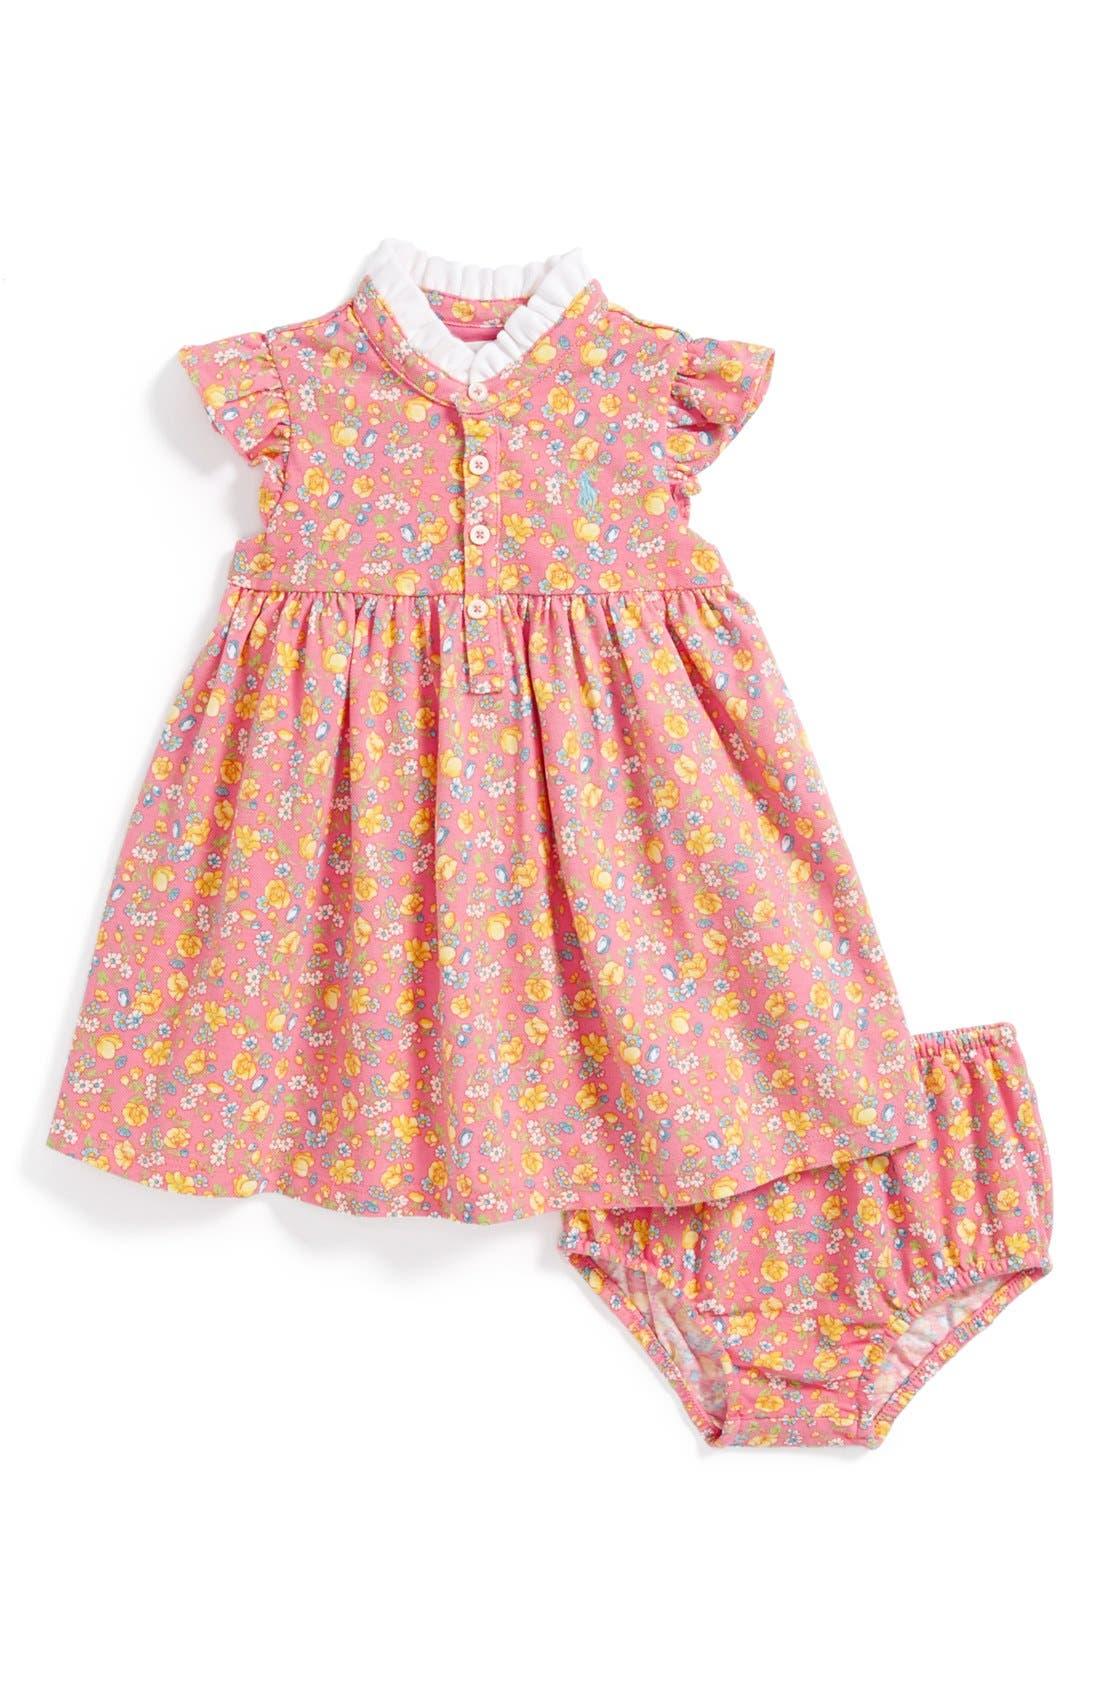 Main Image - Ralph Lauren Floral Print Dress & Bloomers (Baby Girls)